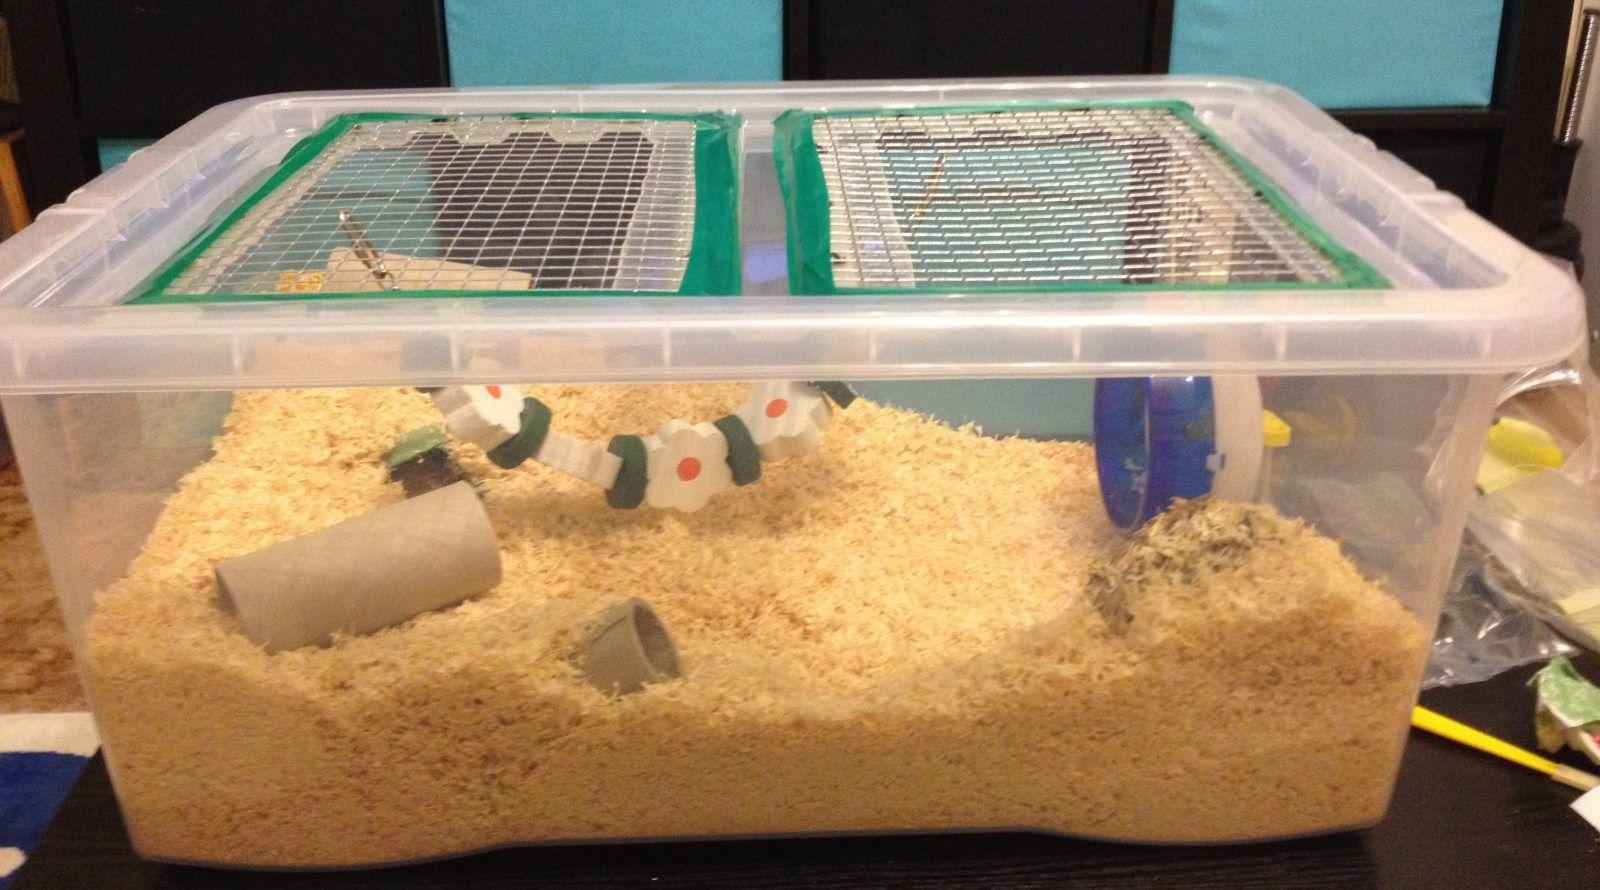 Make A Hamster Cage Thehamsterhut Hamster Cage Hamster Diy Cage Hamster Bin Cage